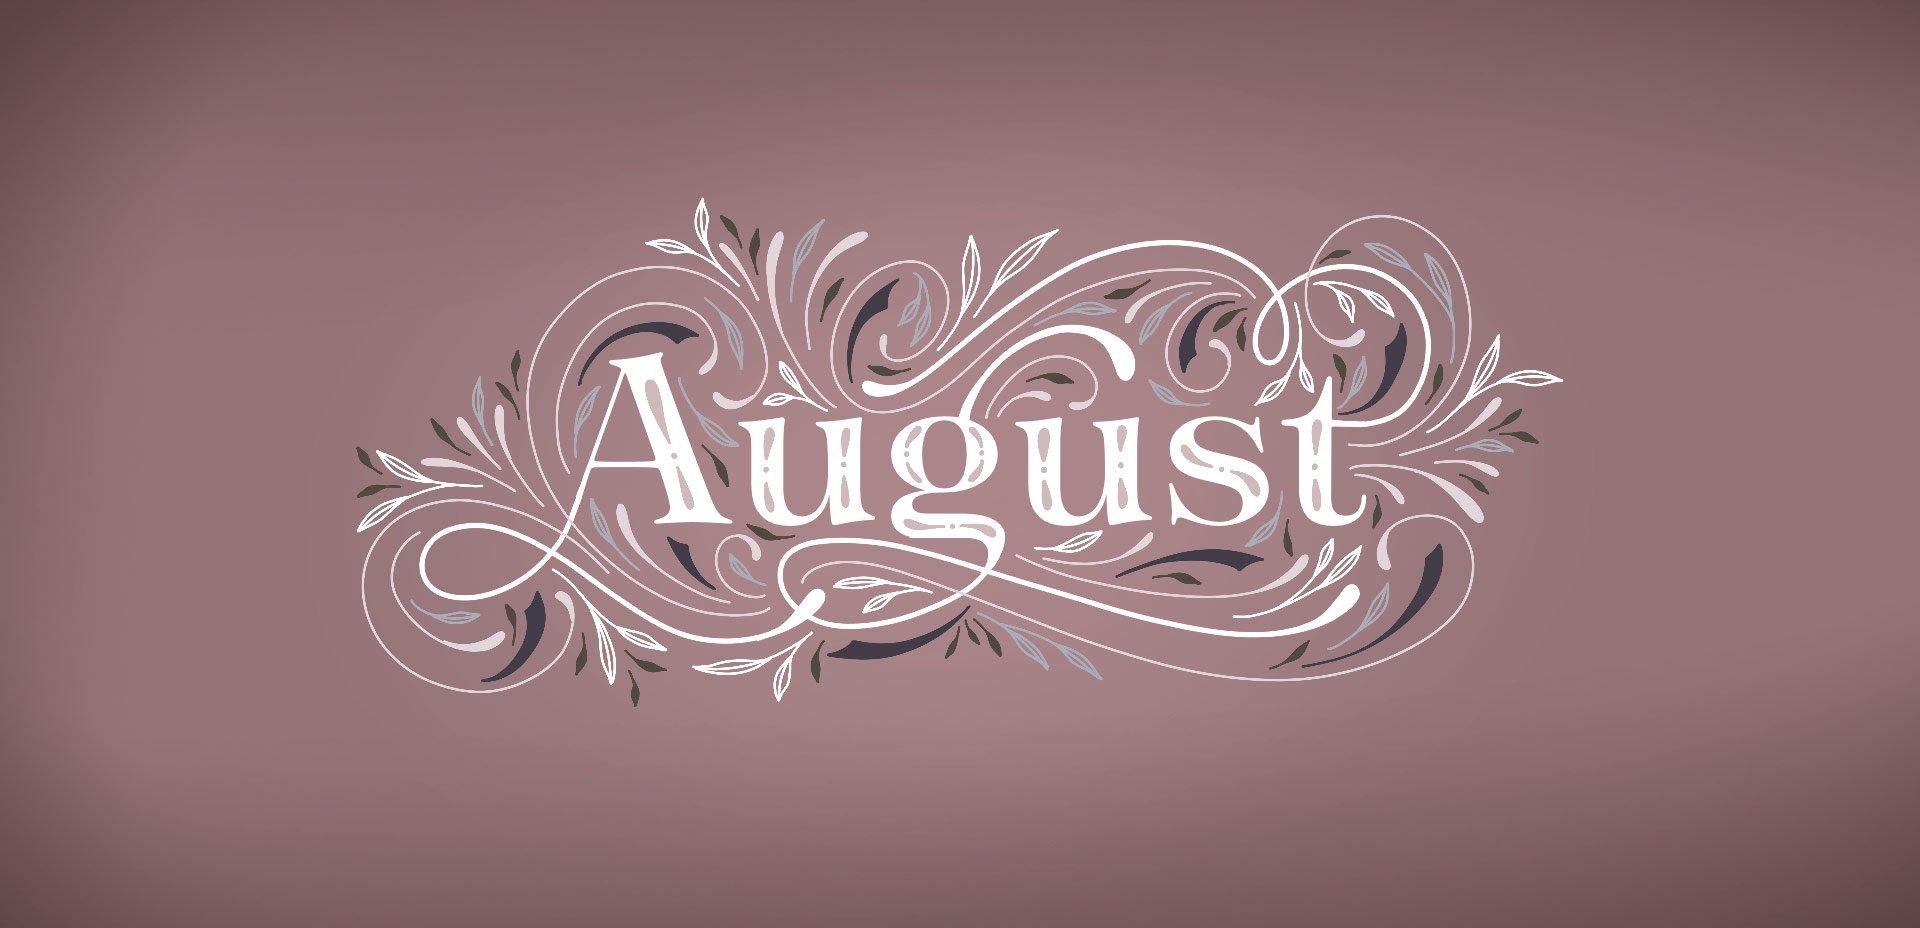 Freebie August 2019 Desktop Wallpapers   Every Tuesday 1920x928